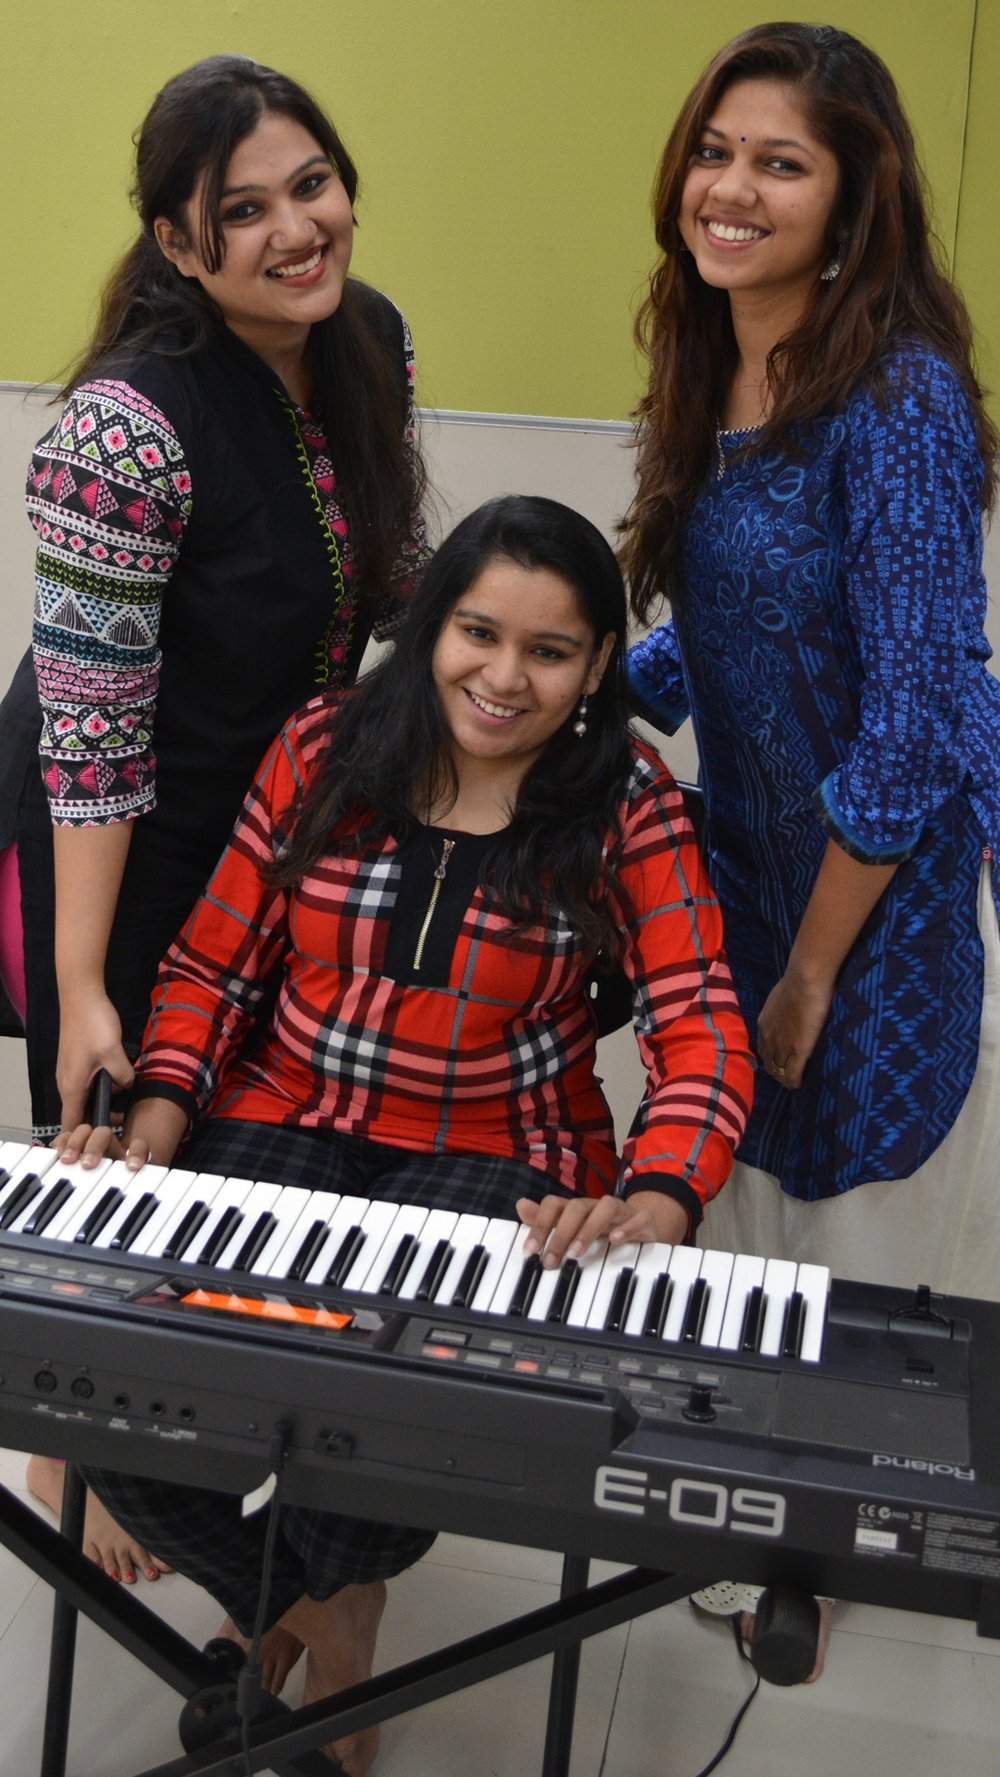 INDIA 2017 - At the piano, sancheti institute